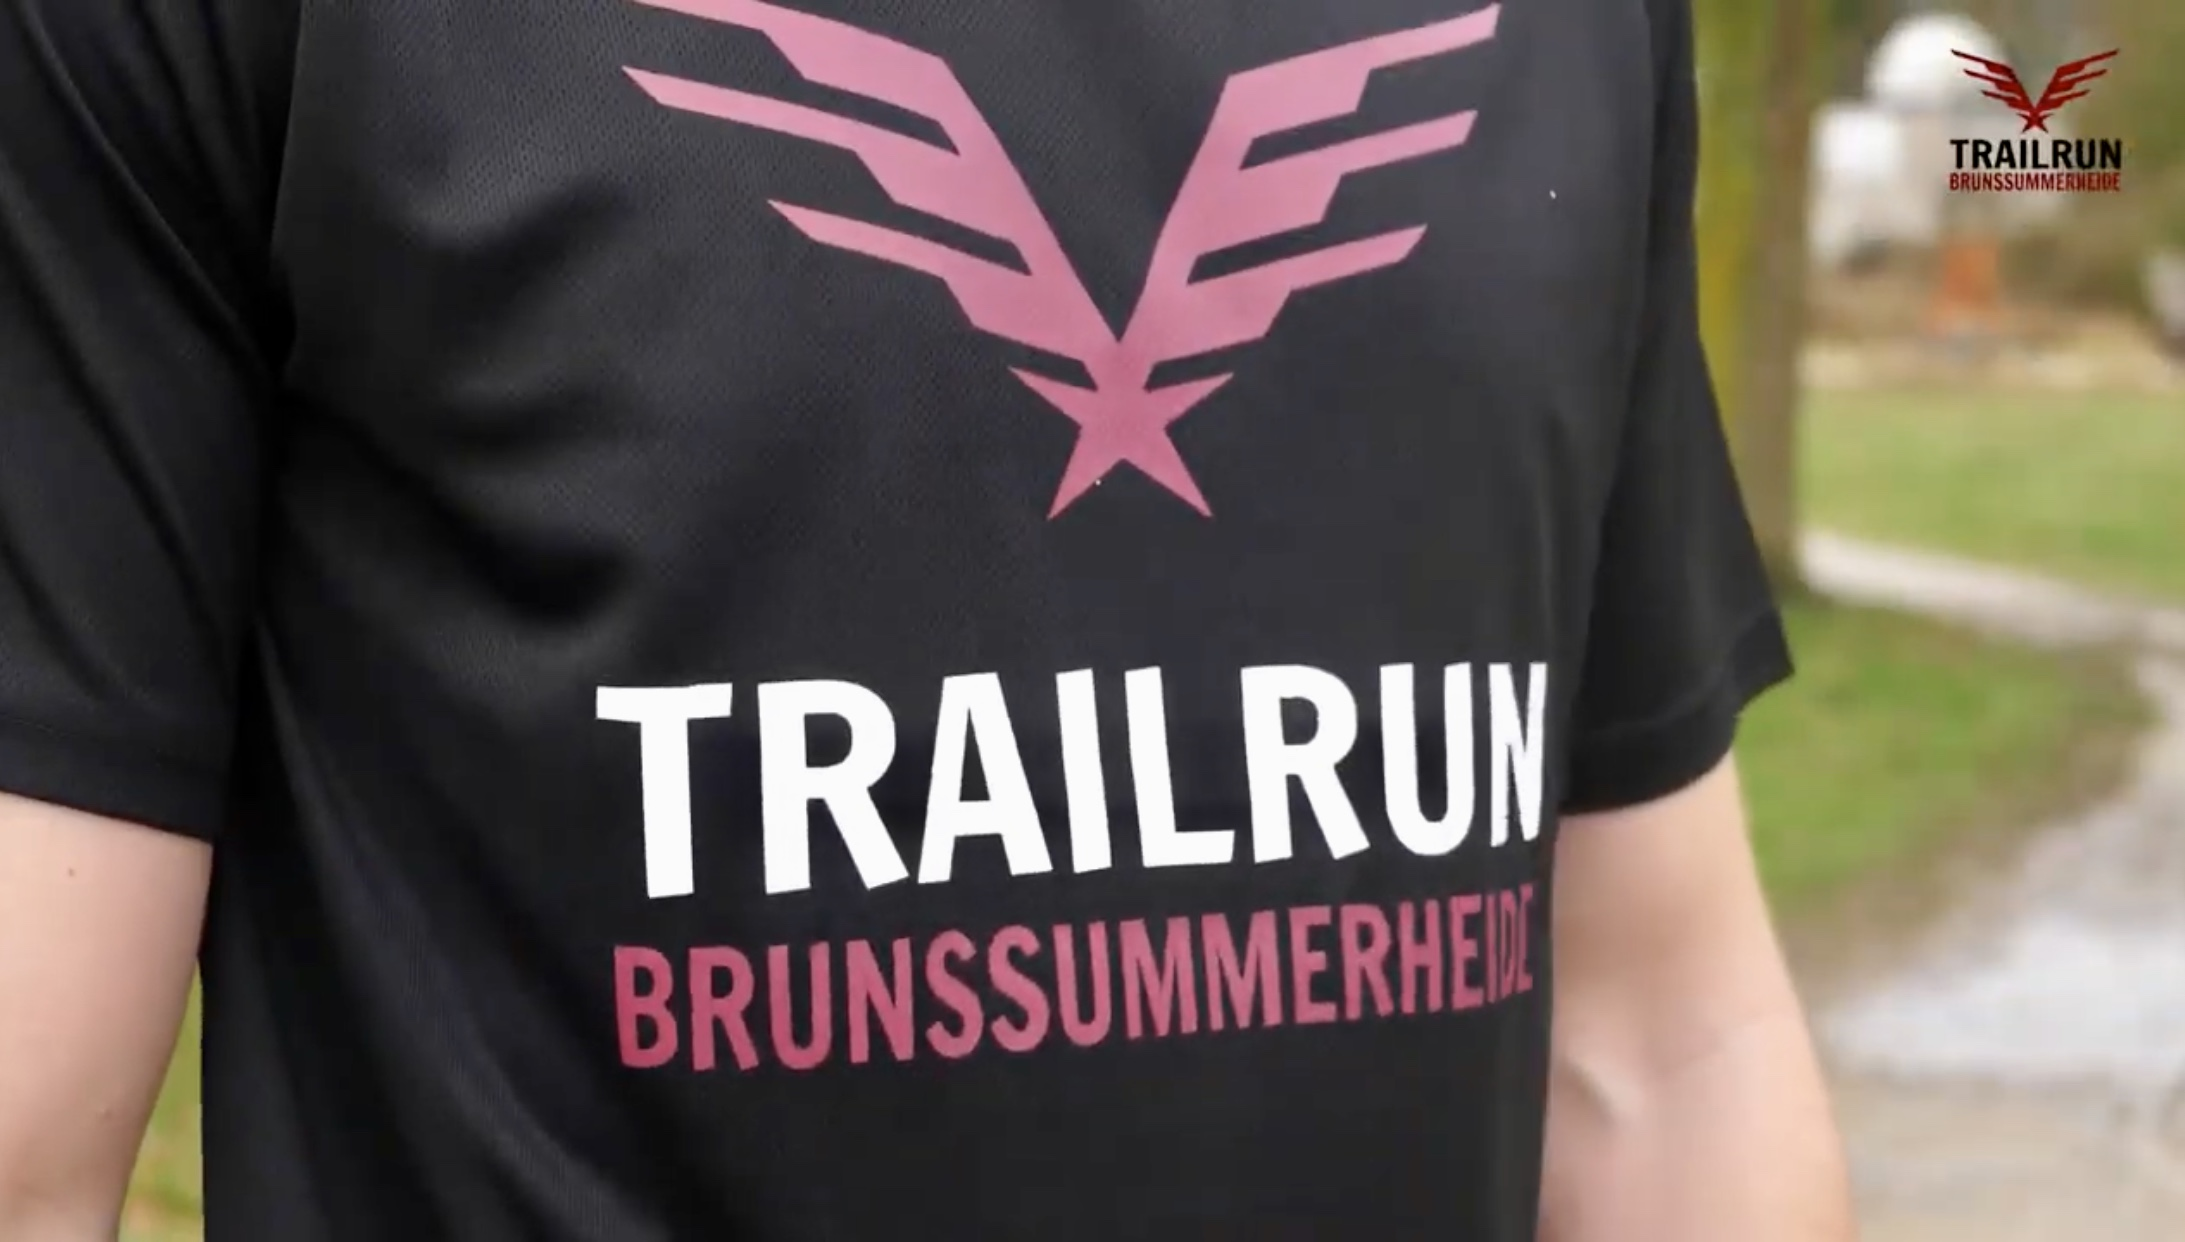 Trailrun Brunssummerheide 2020 loopshirt